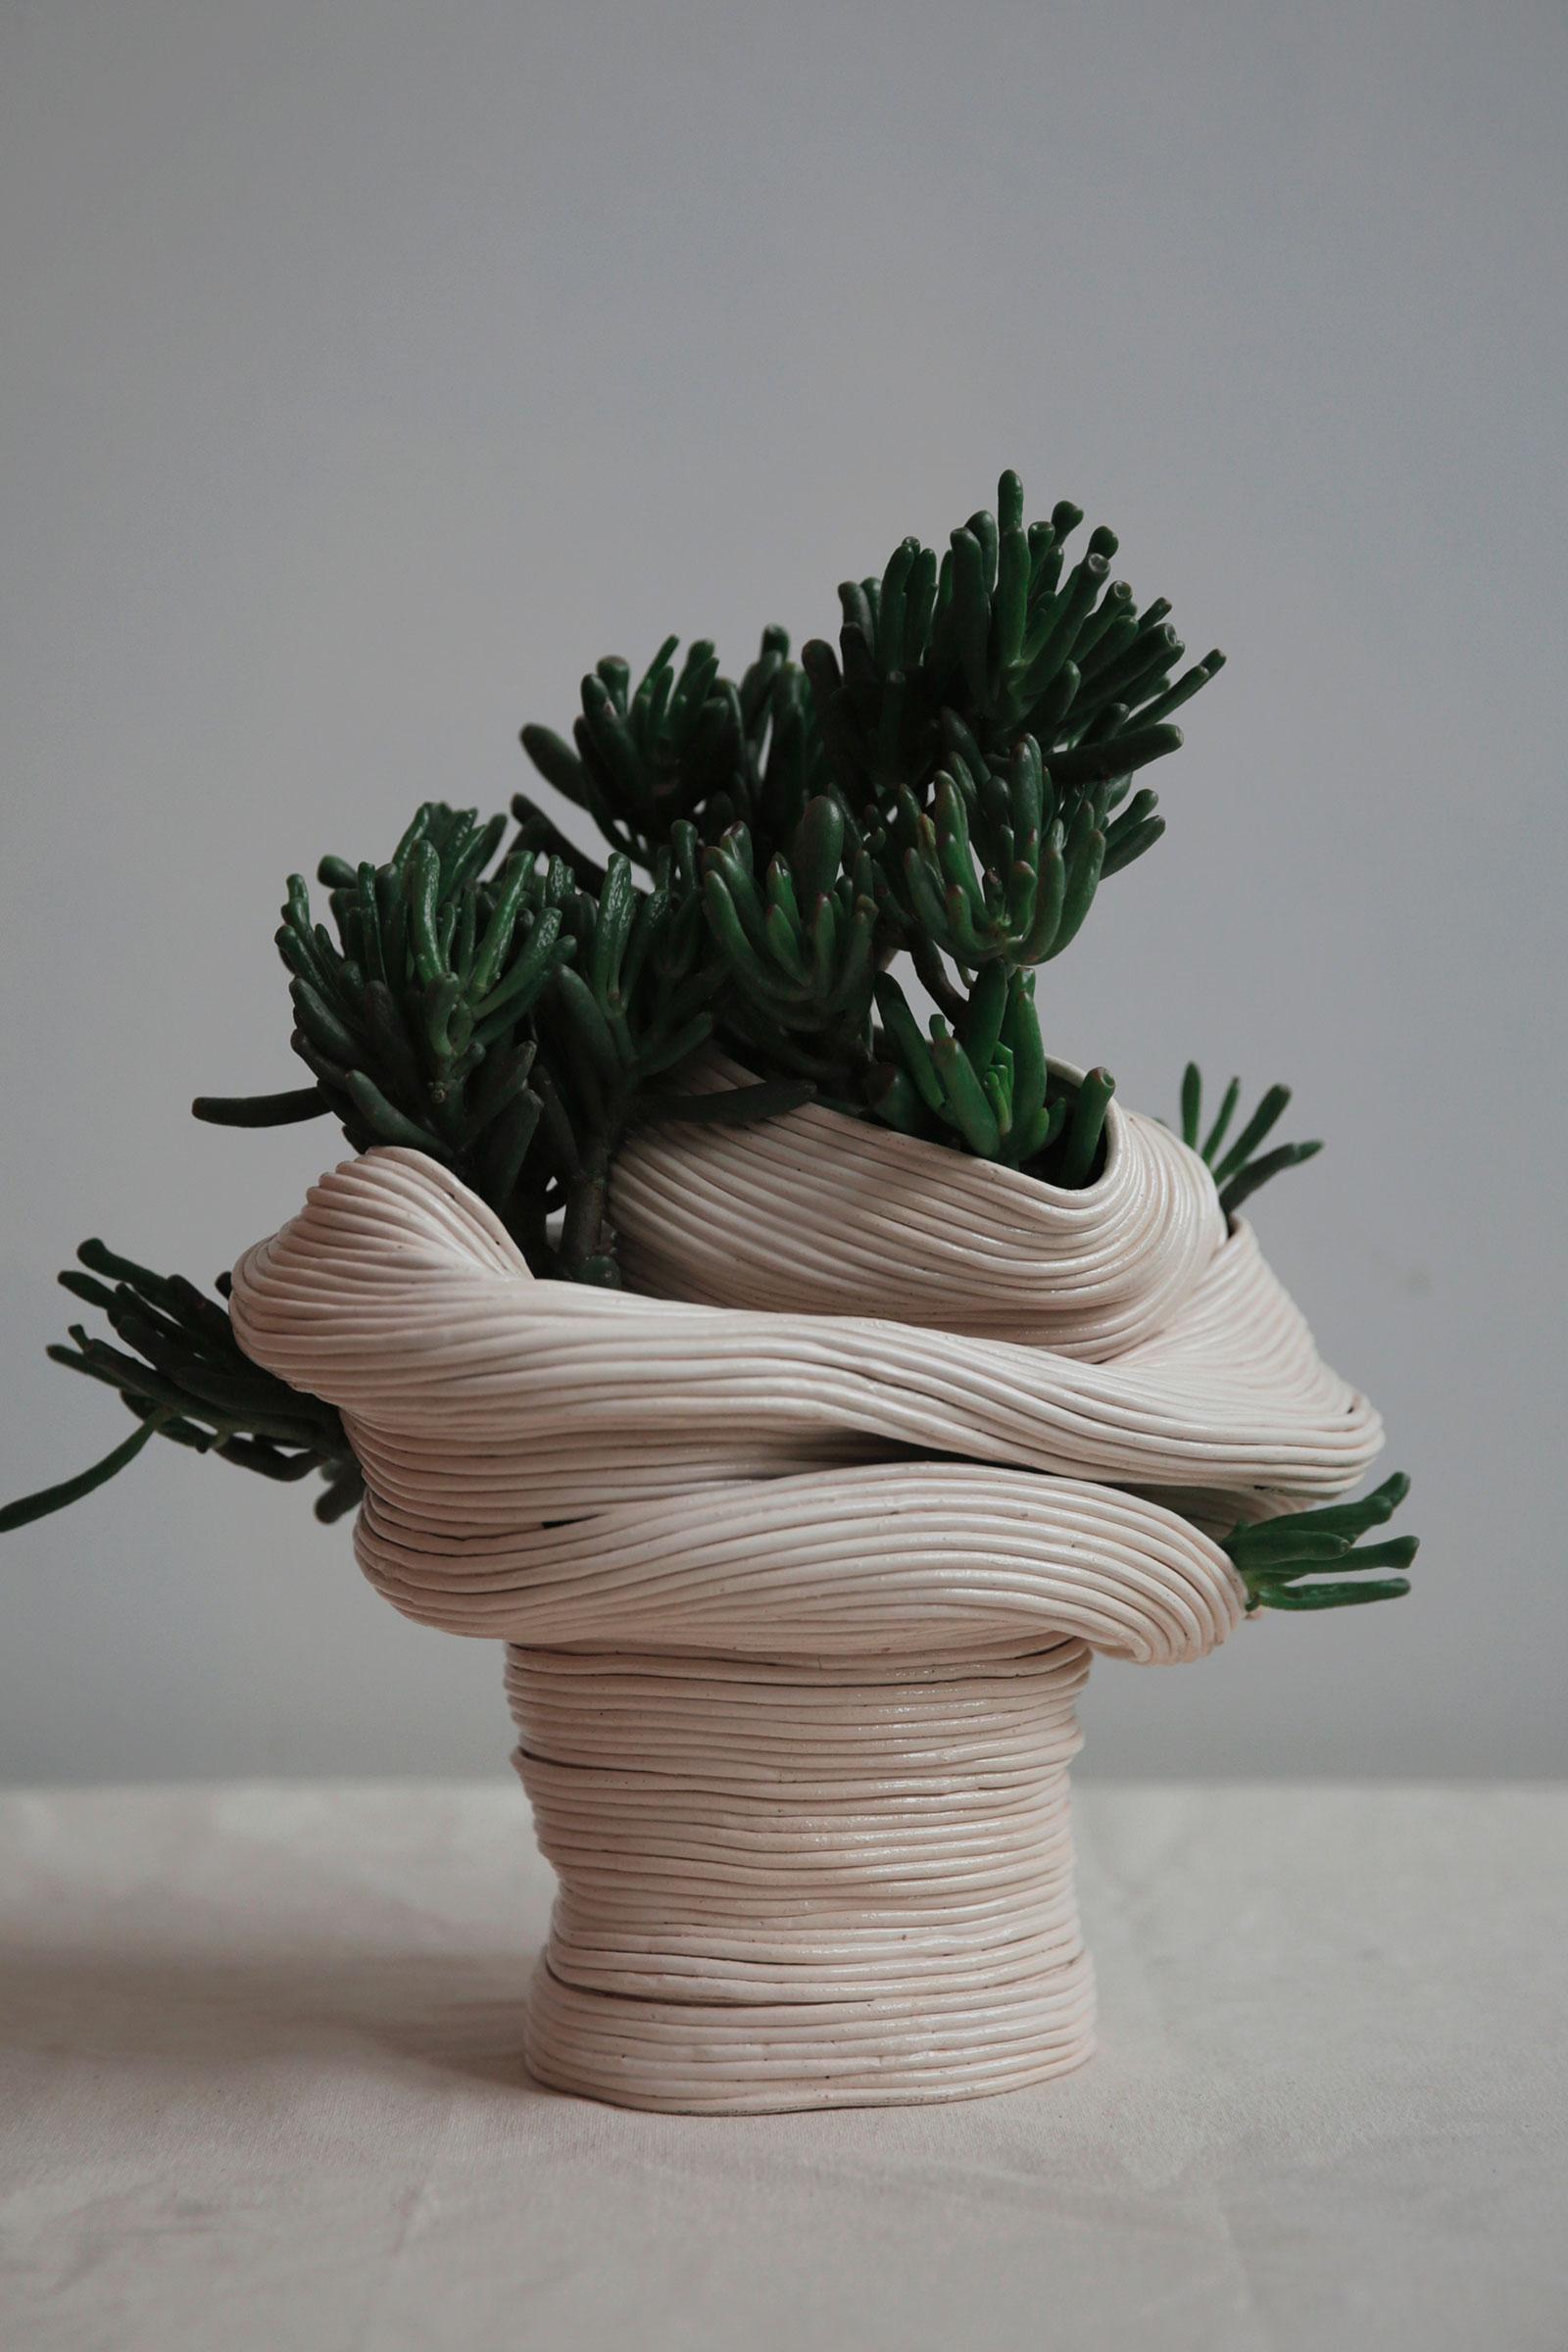 zhu-ohmu-jade-plant3.jpg